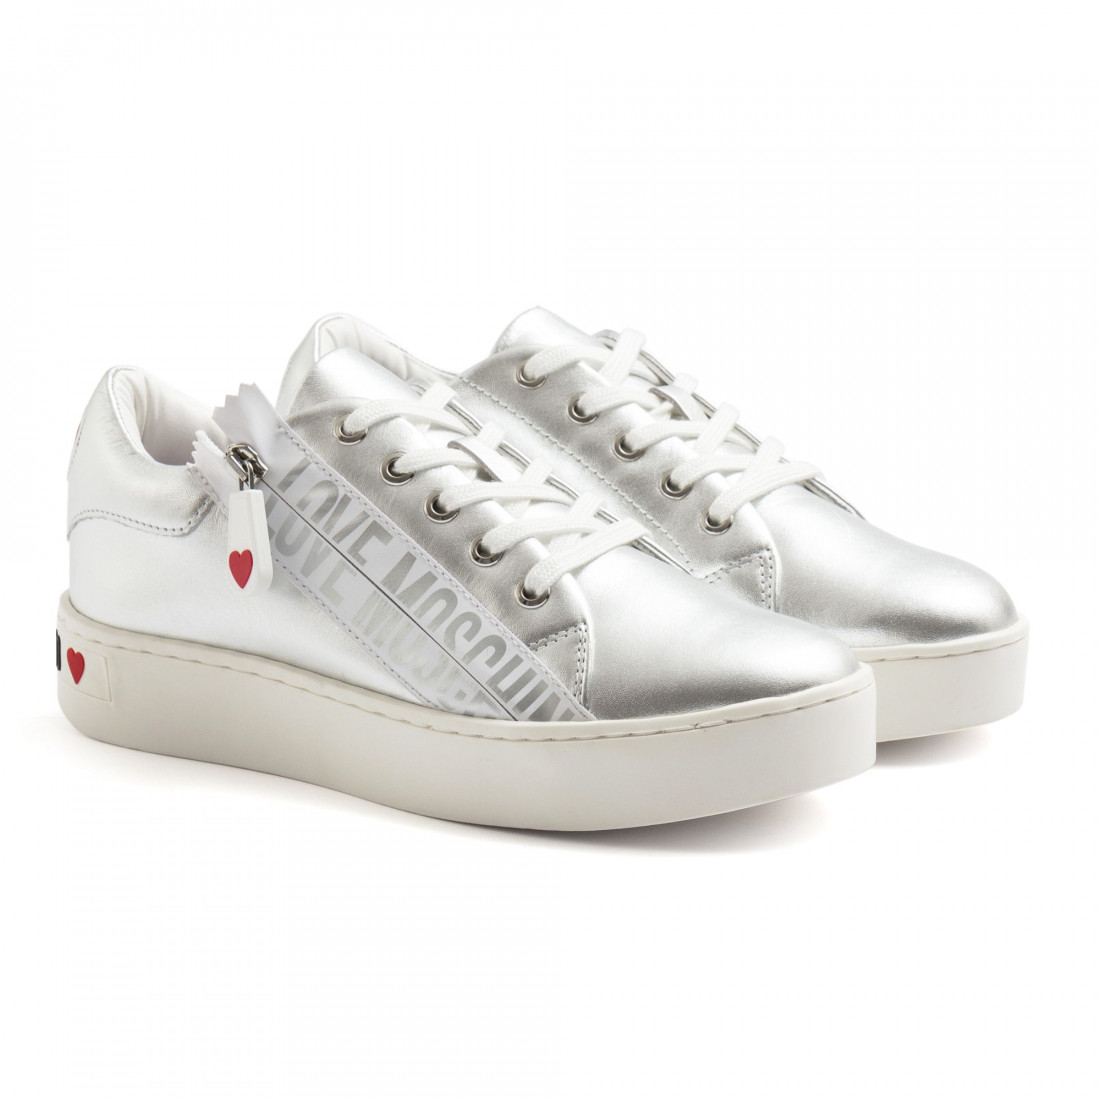 sneakers damen love moschino ja15093g1cibo902 8087